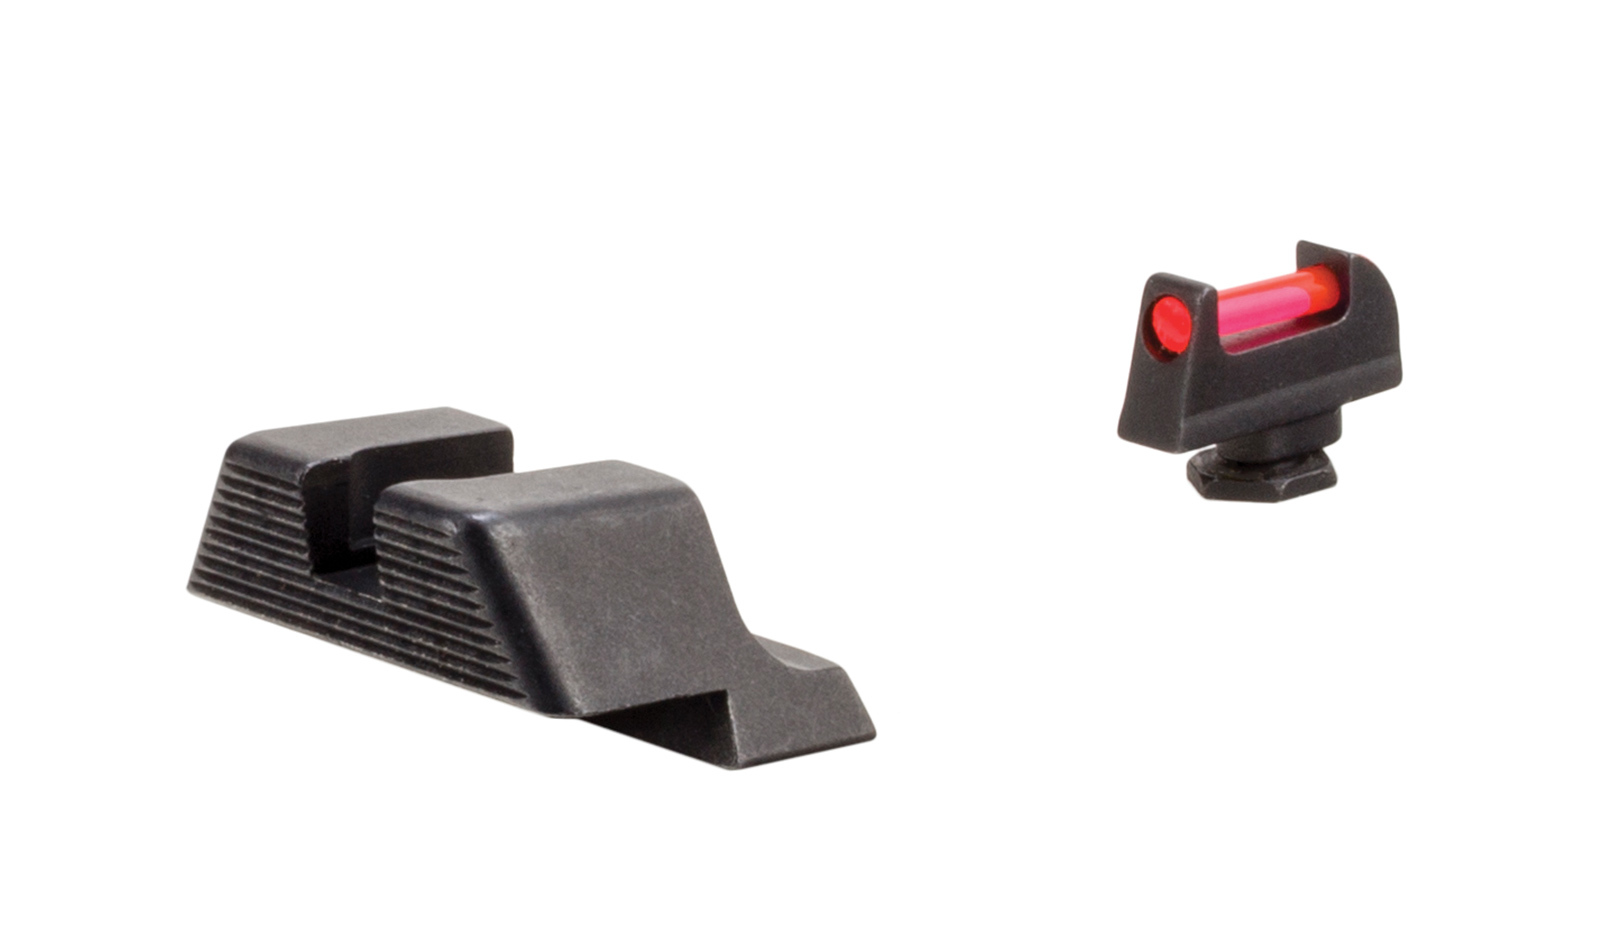 Trijicon<sup>®</sup> Fiber Sights - Glock LargeFrames